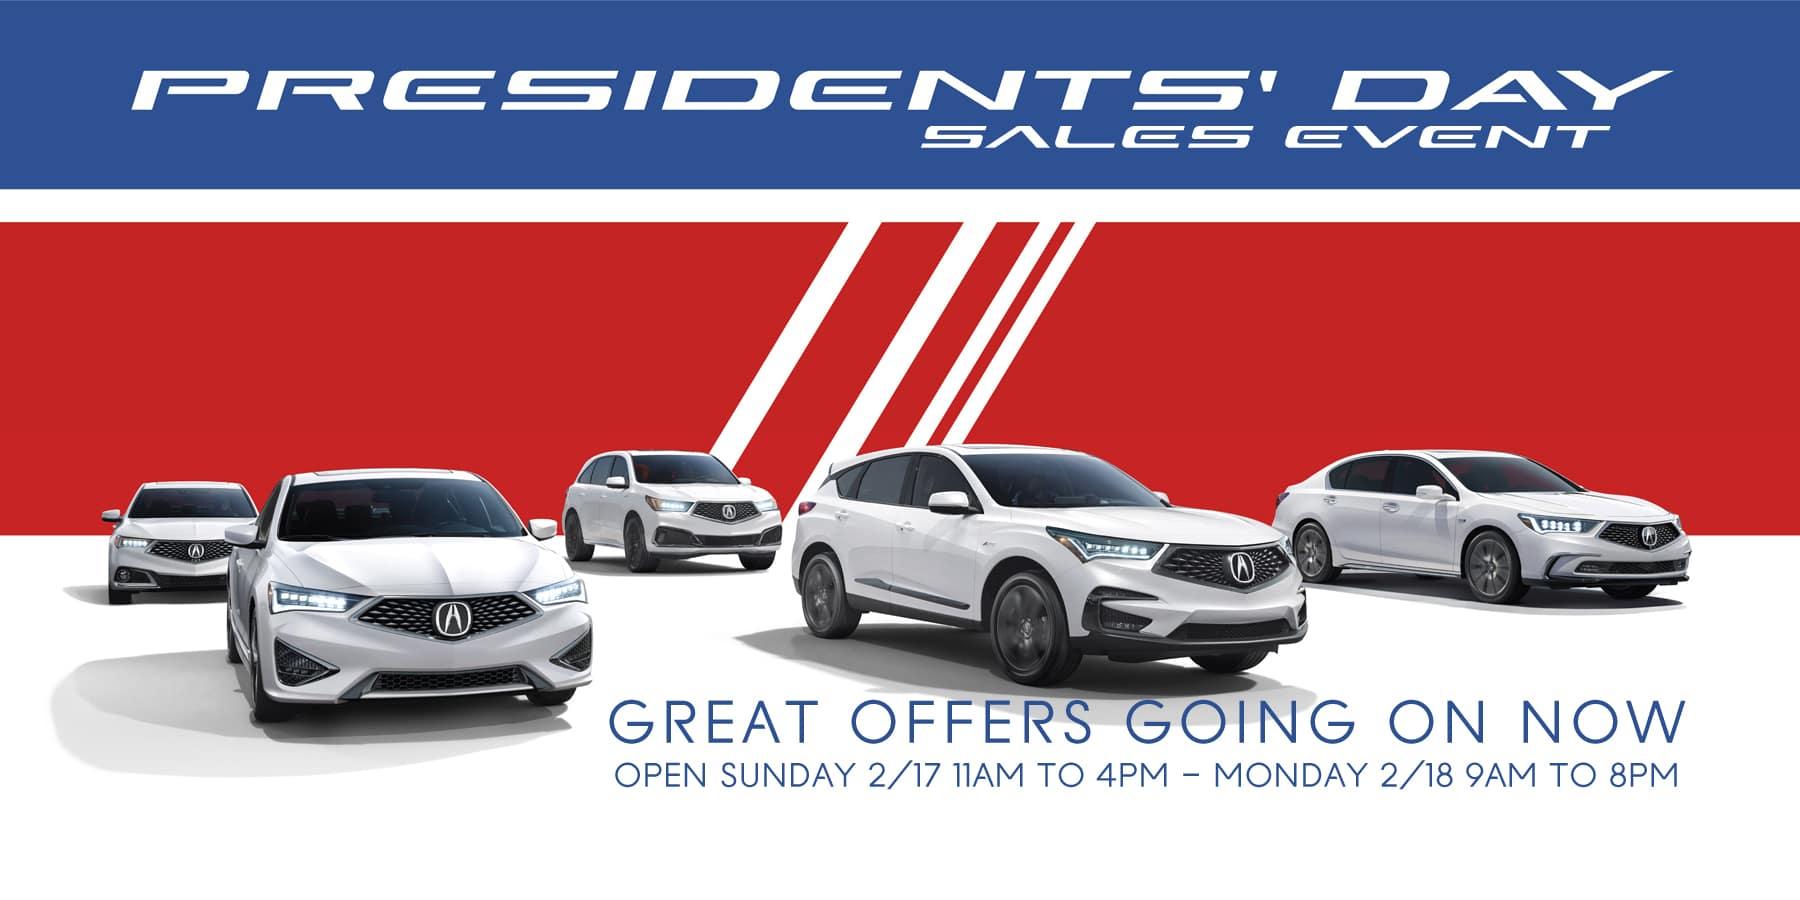 Presidents' Day Sales Event Sunnyside Acura Nashua NH 03063